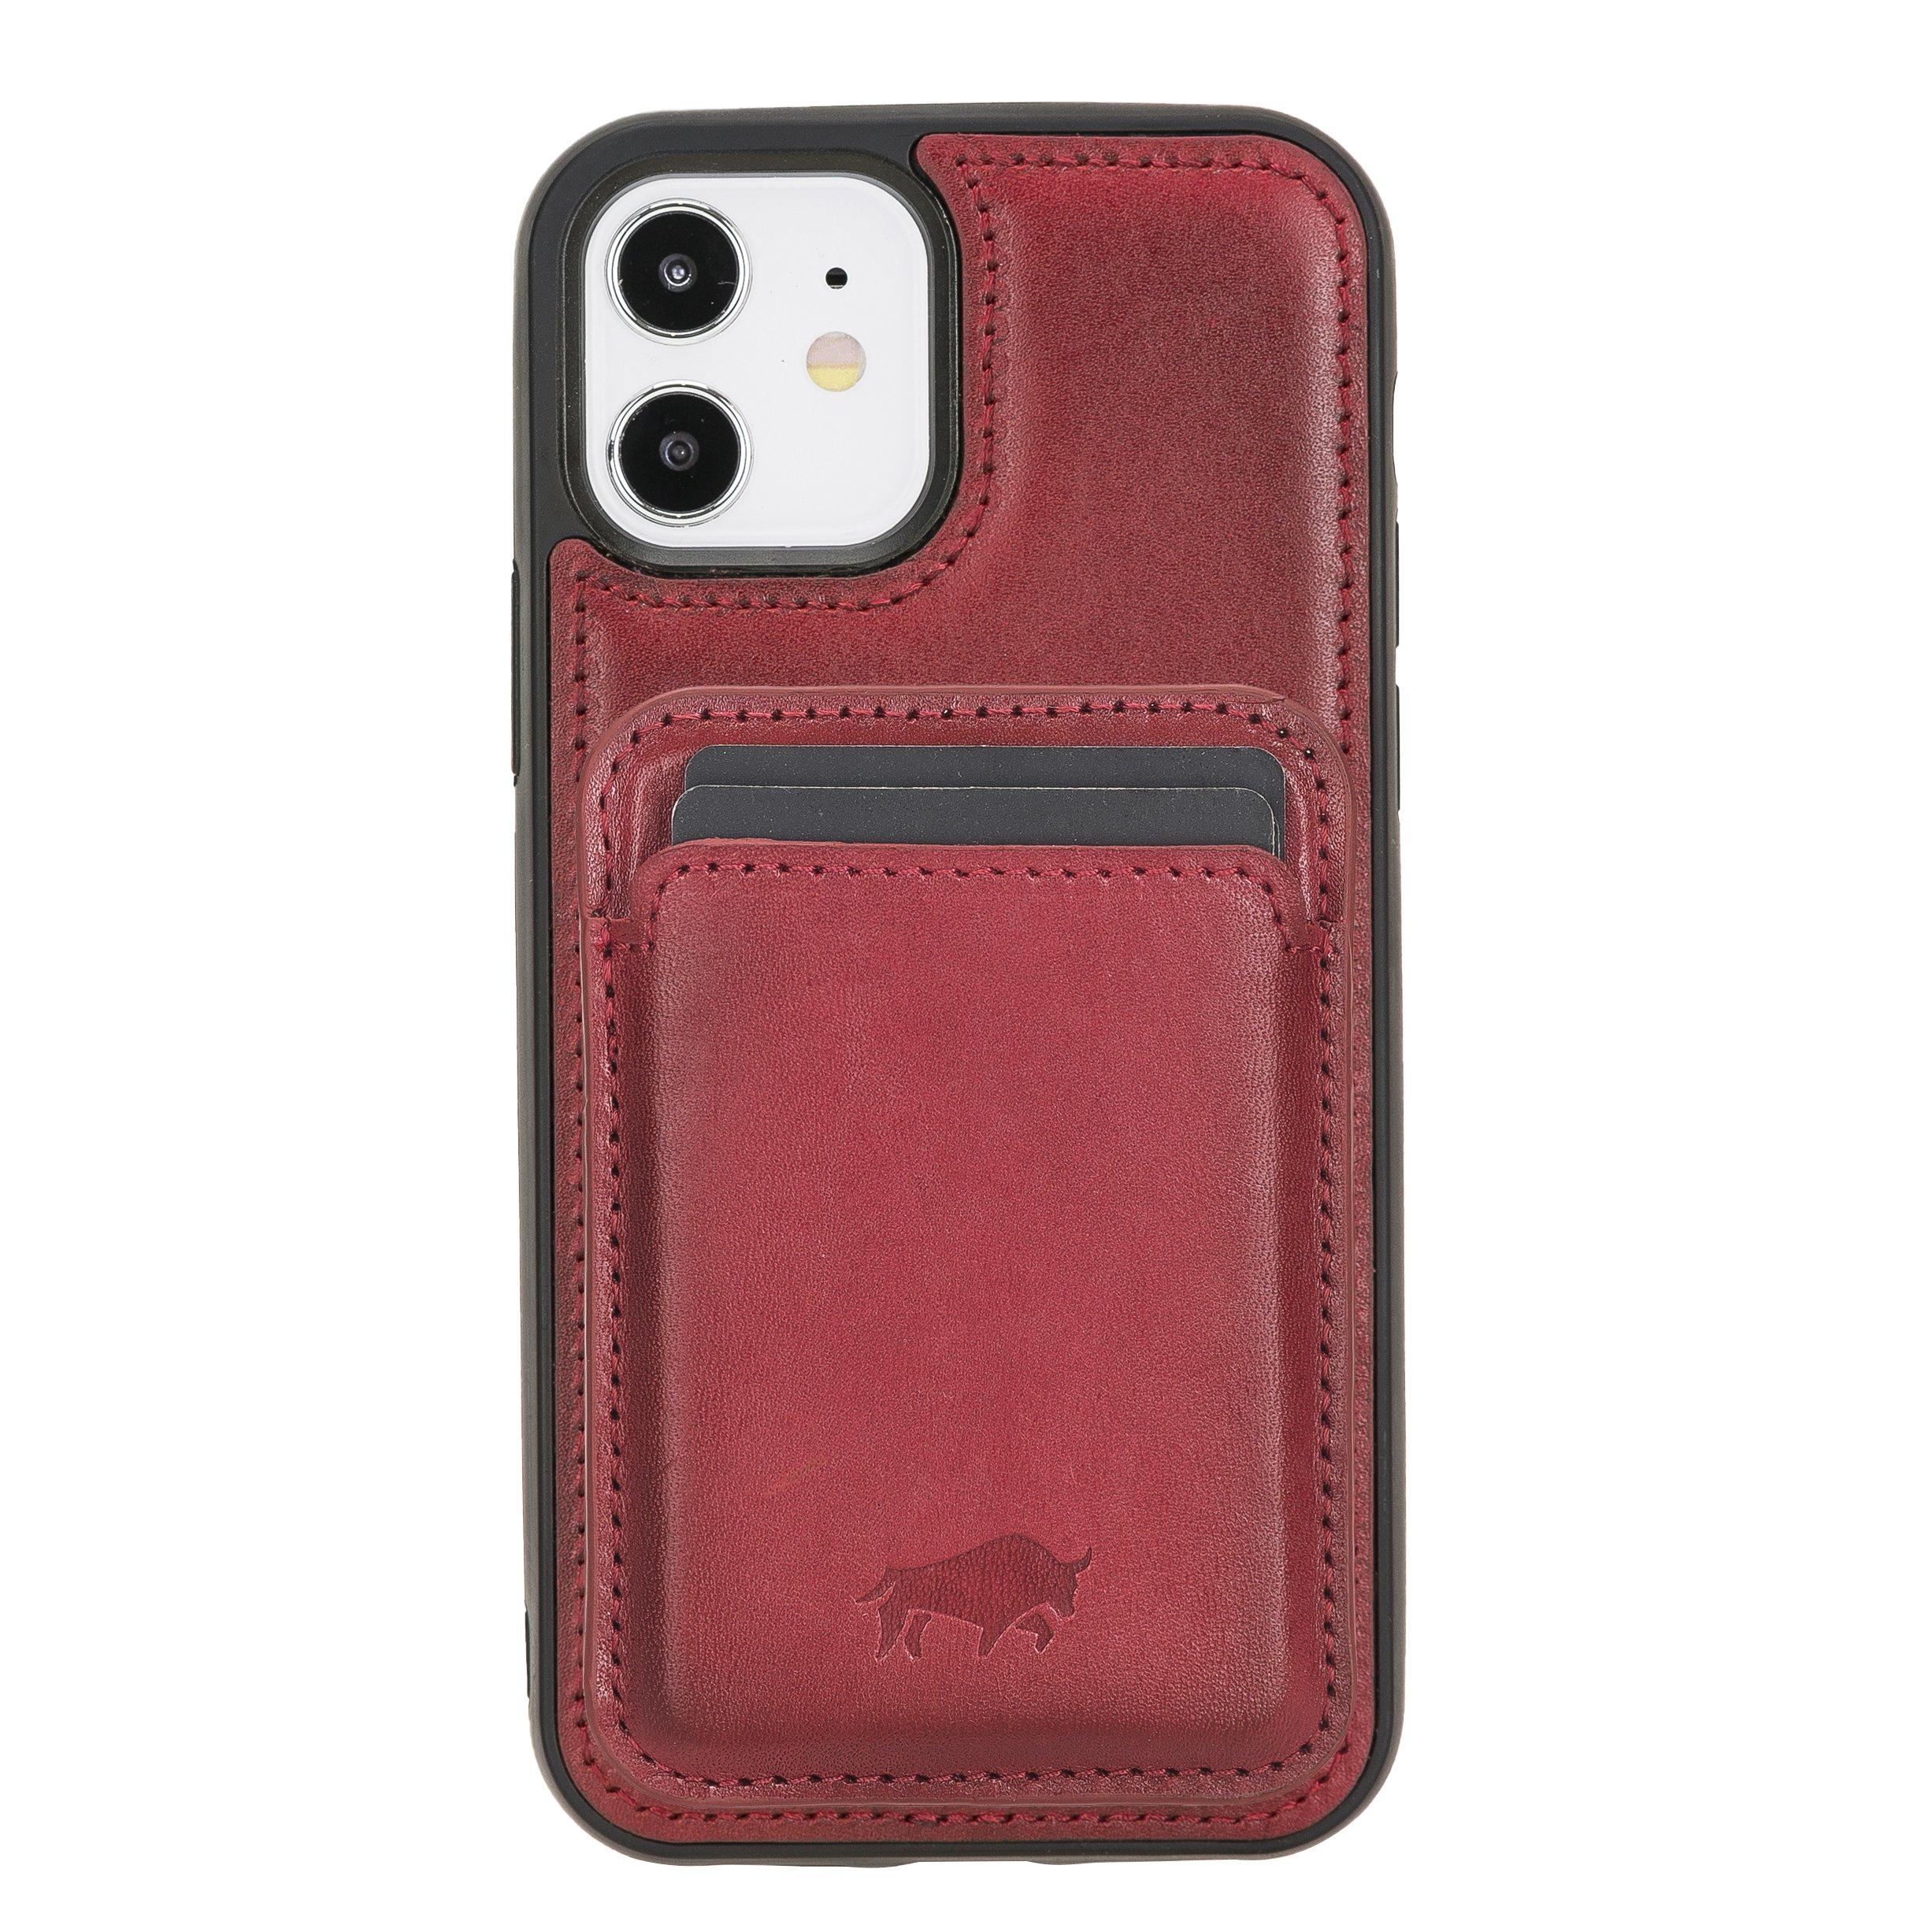 Solo Pelle Lederhülle + magnetische Geldbörse (Magsafe) für das iPhone 12 Mini in 5.4 Zoll Stanford Case Leder Hülle Ledertasche Backcover aus echtem Leder (Rot)